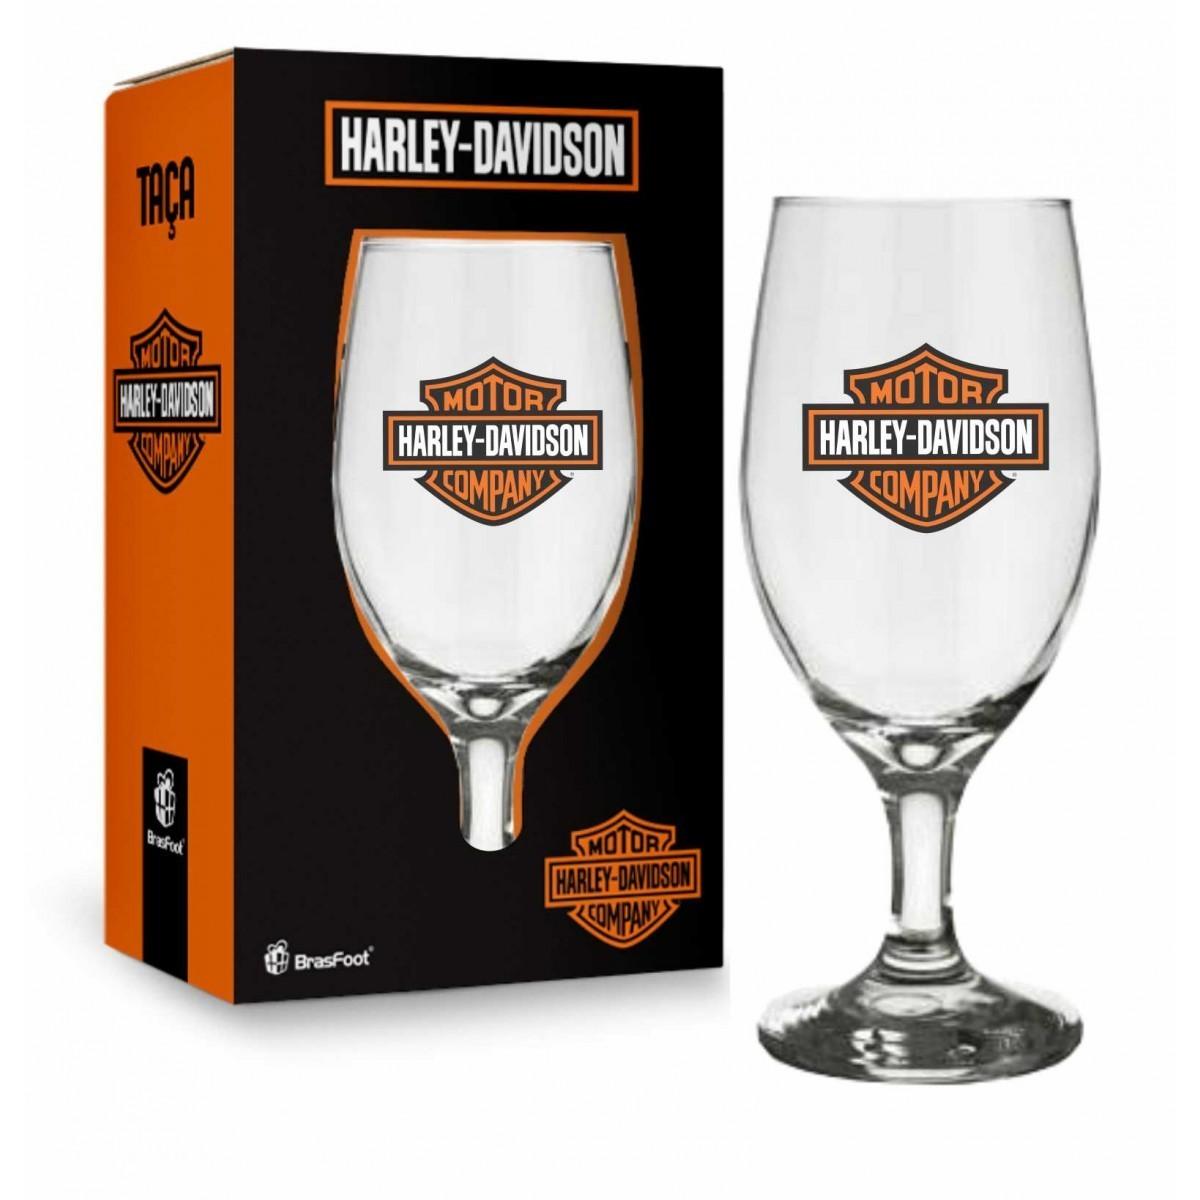 Taça Windsor 330ml - Harley Davidson Presente Brasfoot